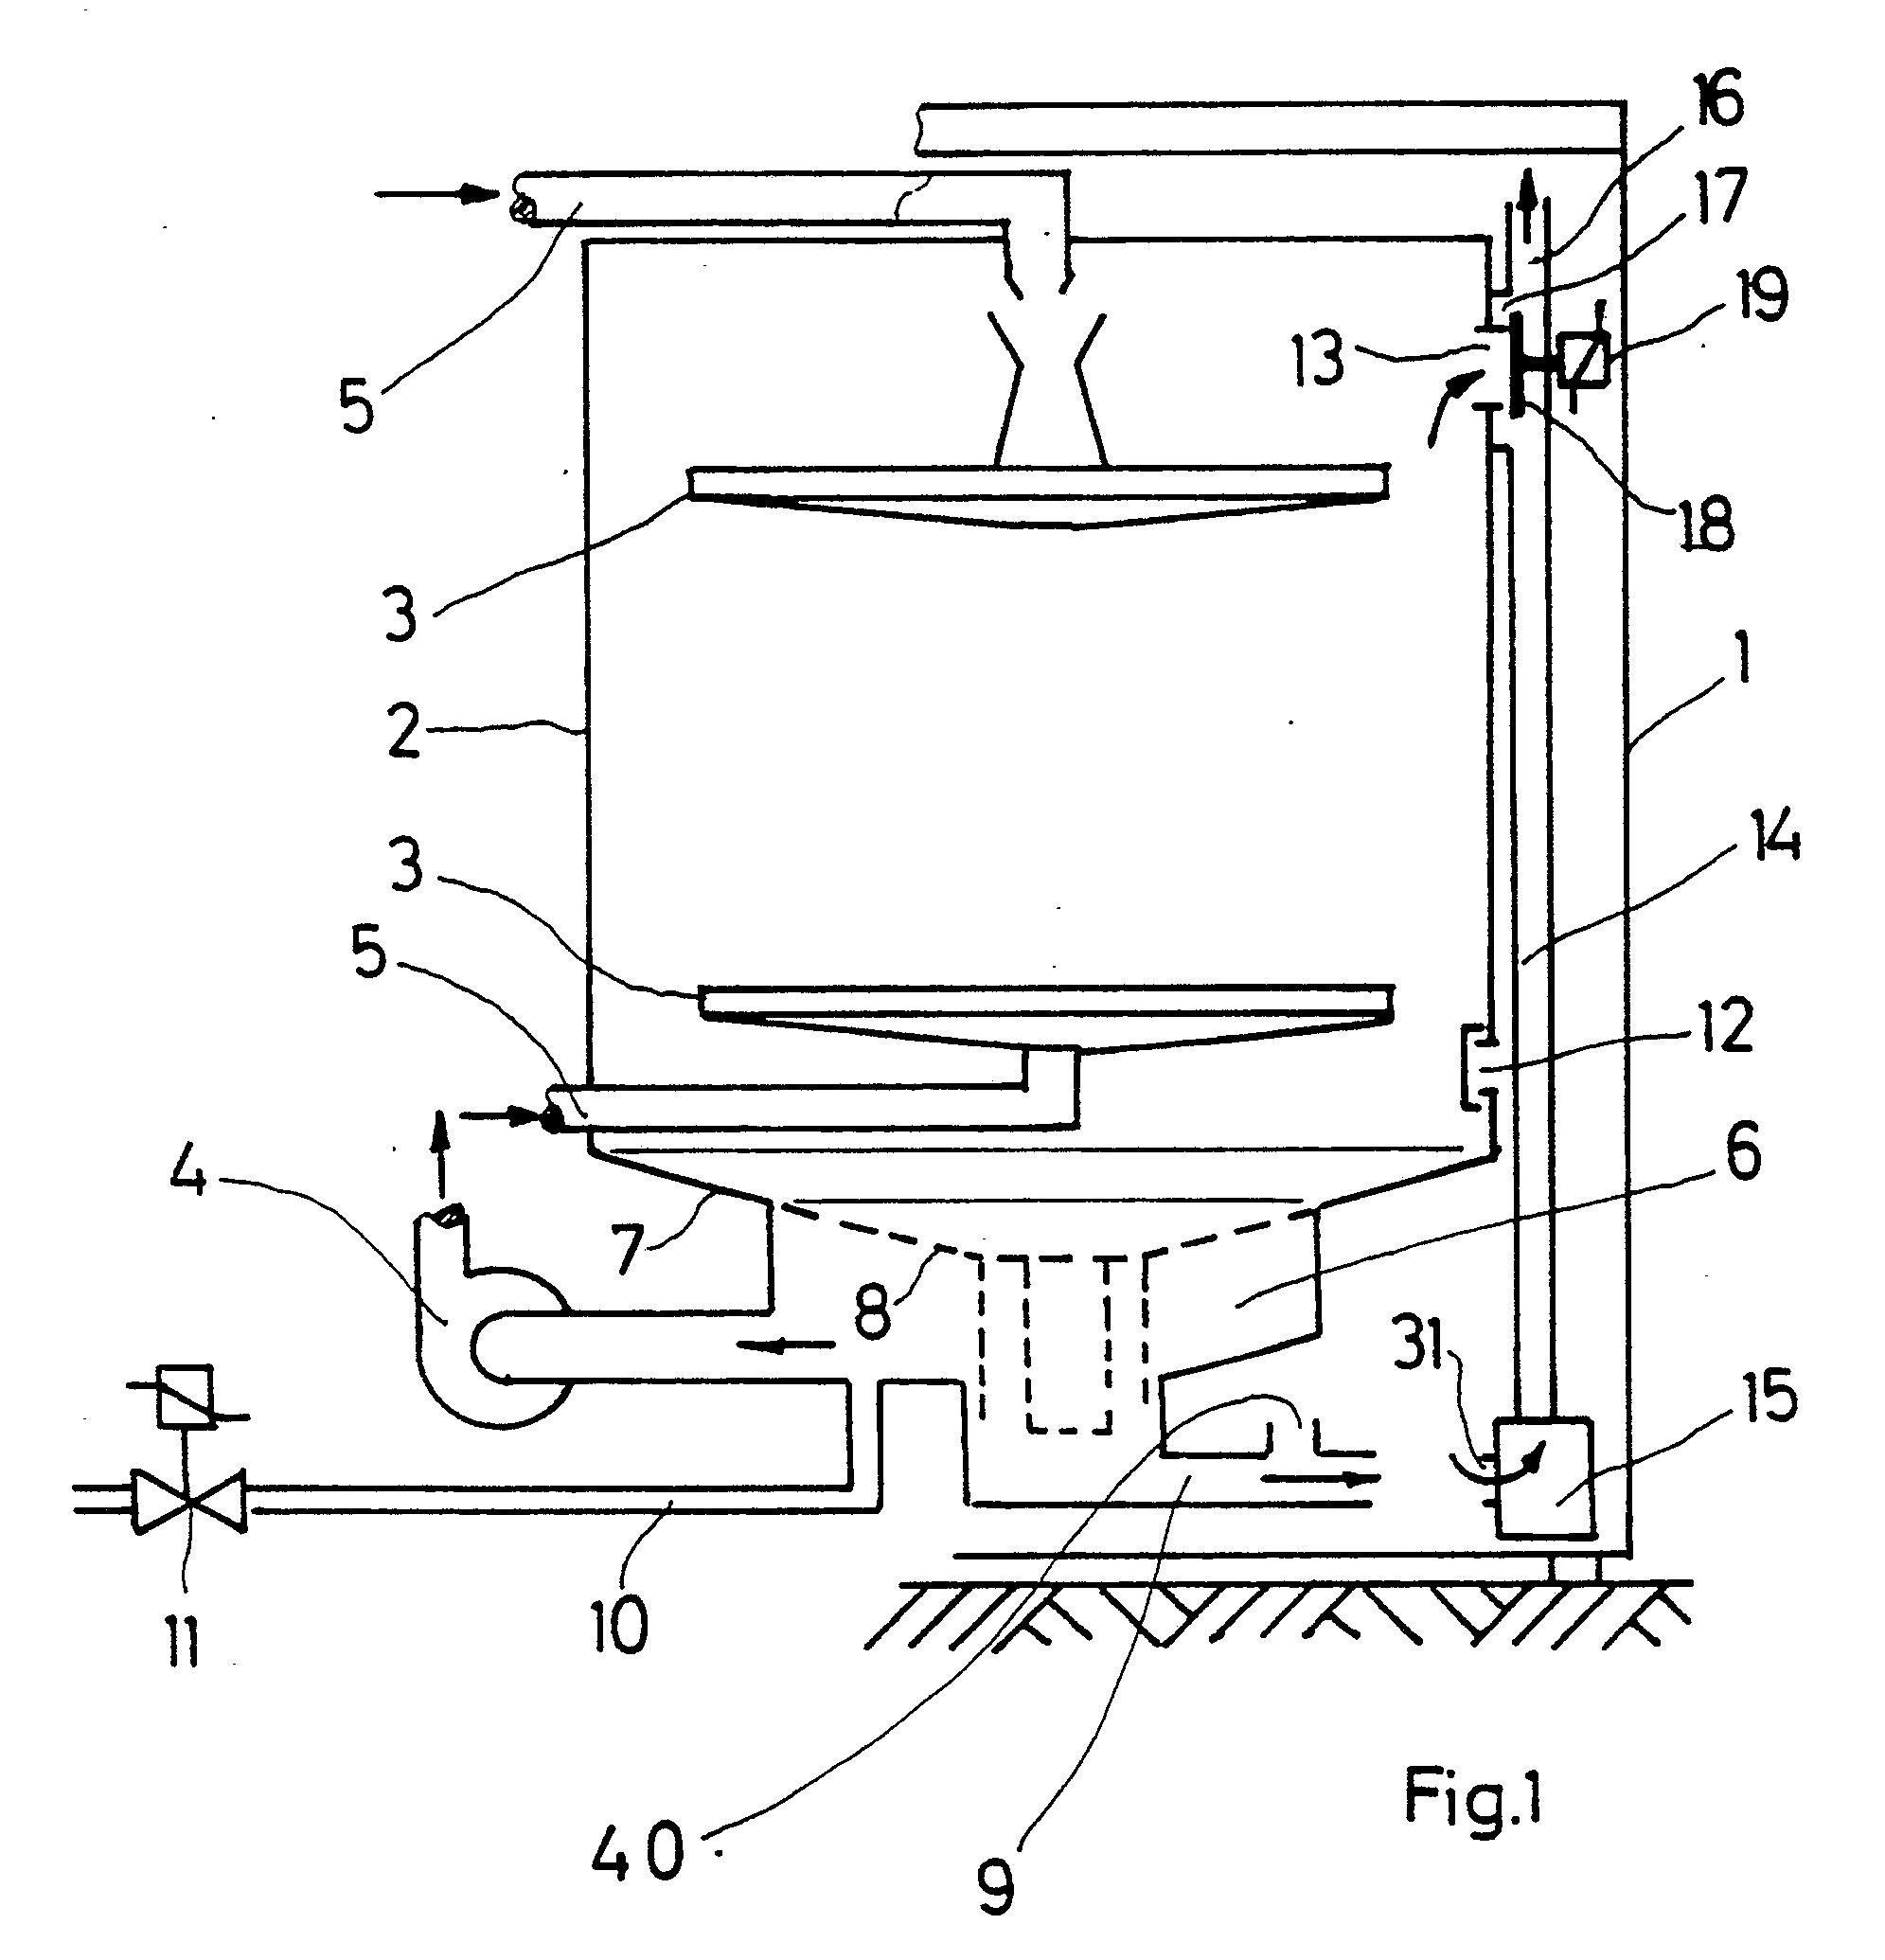 patent ep0378836a1 geschirrsp lmaschine mit entl ftungs ffnung google patents. Black Bedroom Furniture Sets. Home Design Ideas